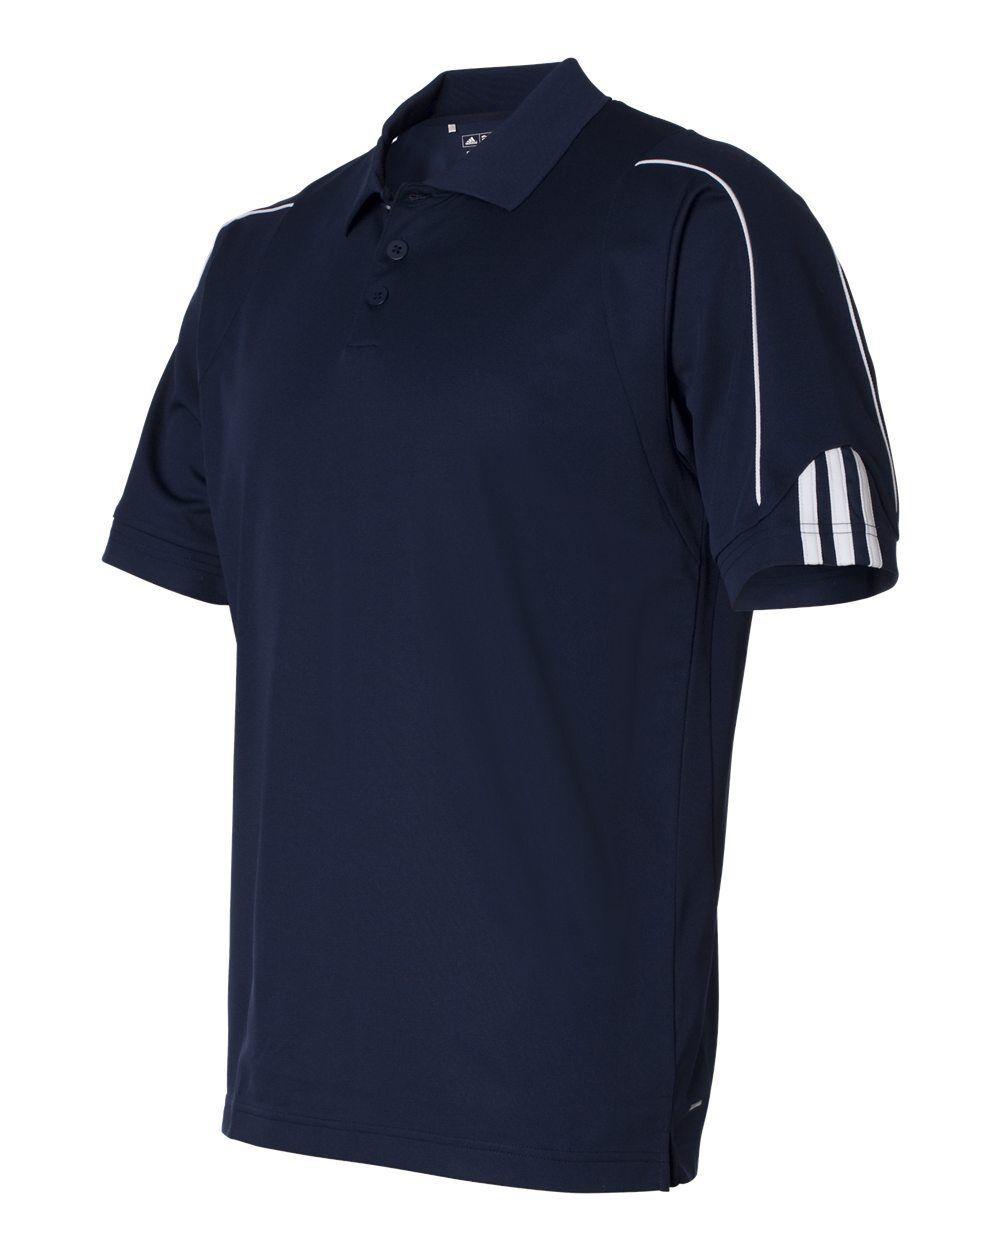 adidas shirt 3 xl